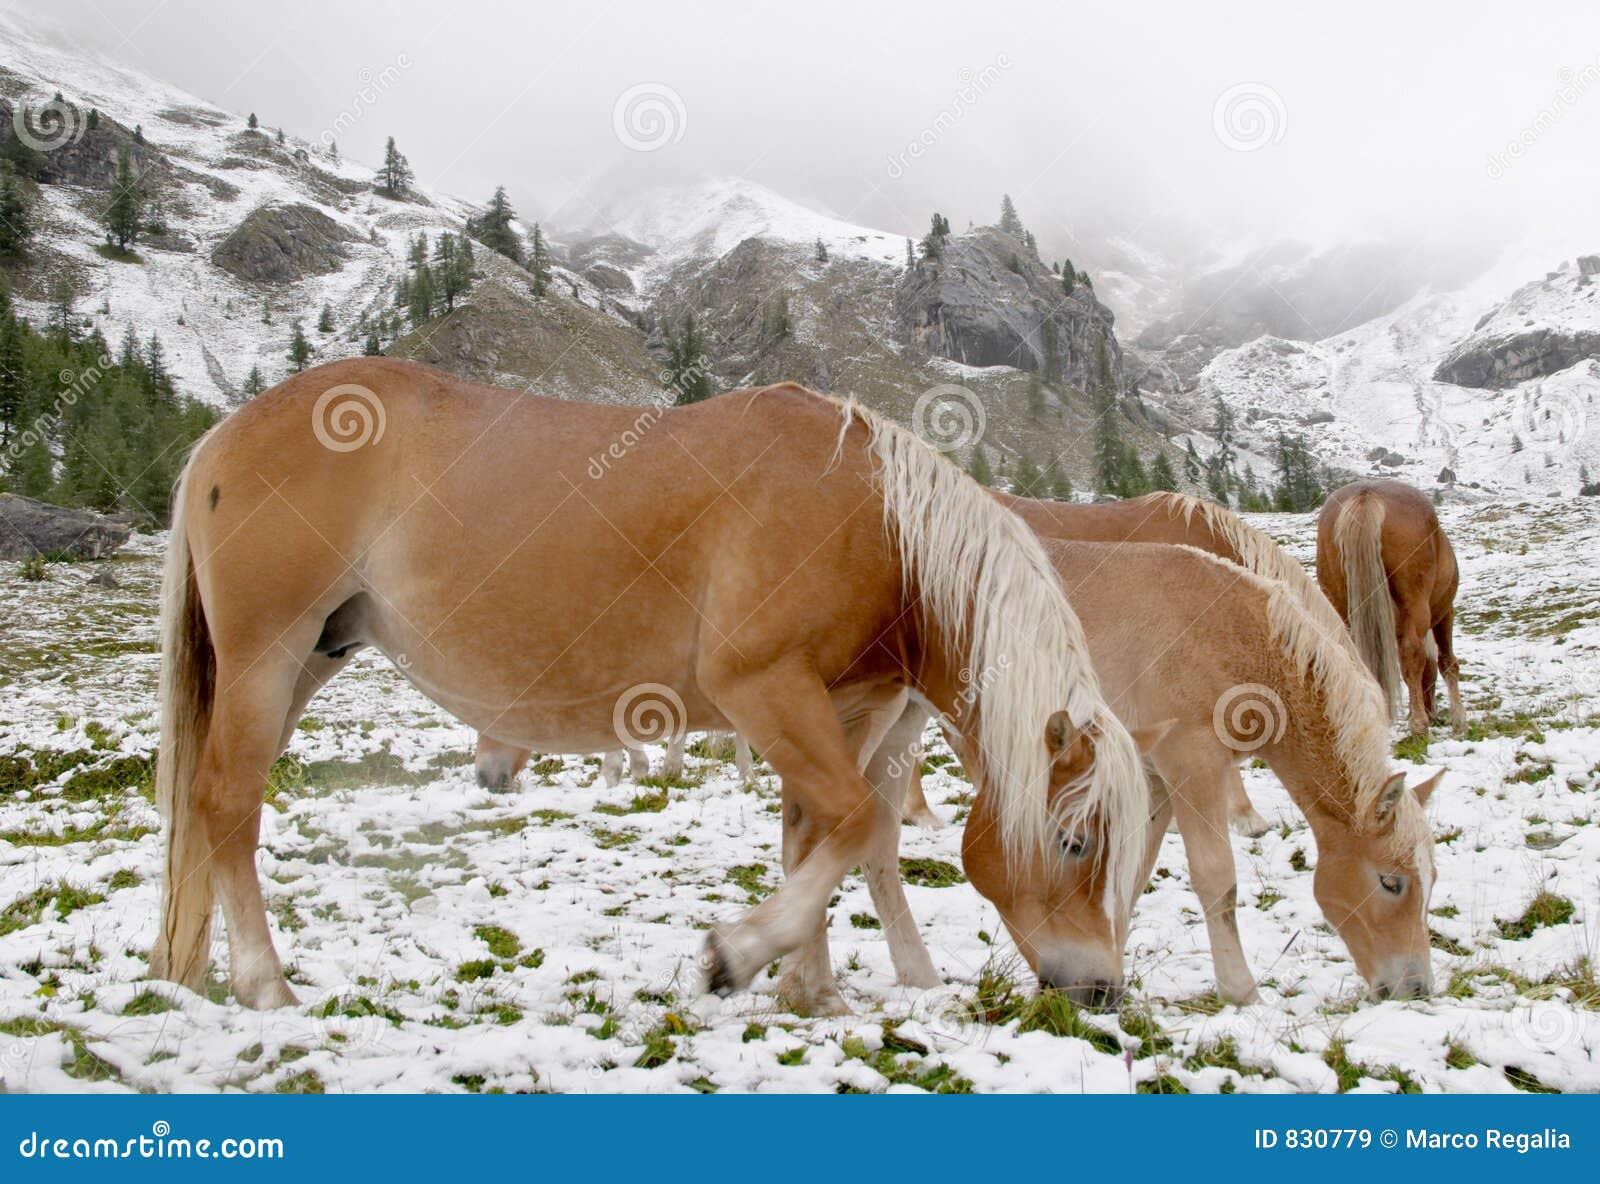 Wild horses in Dolomite Mountains